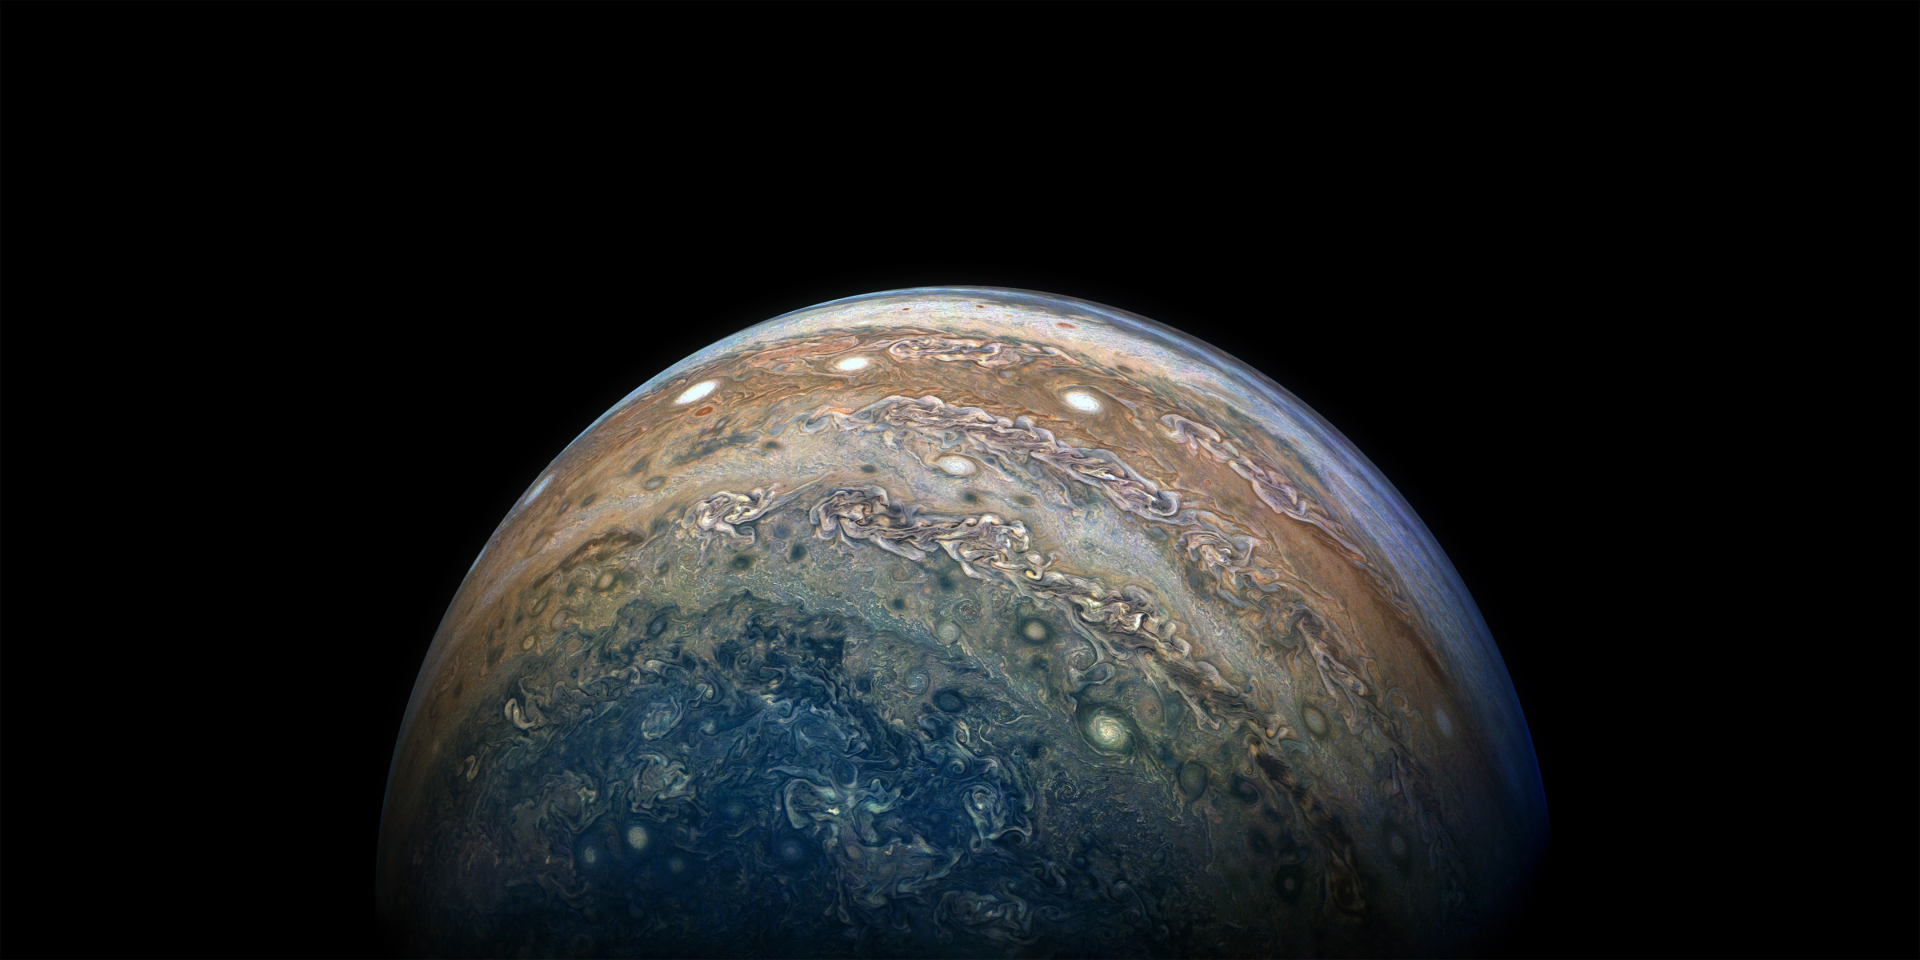 Jupiter 4k ultra hd wallpaper background image - Jupiter wallpaper ...